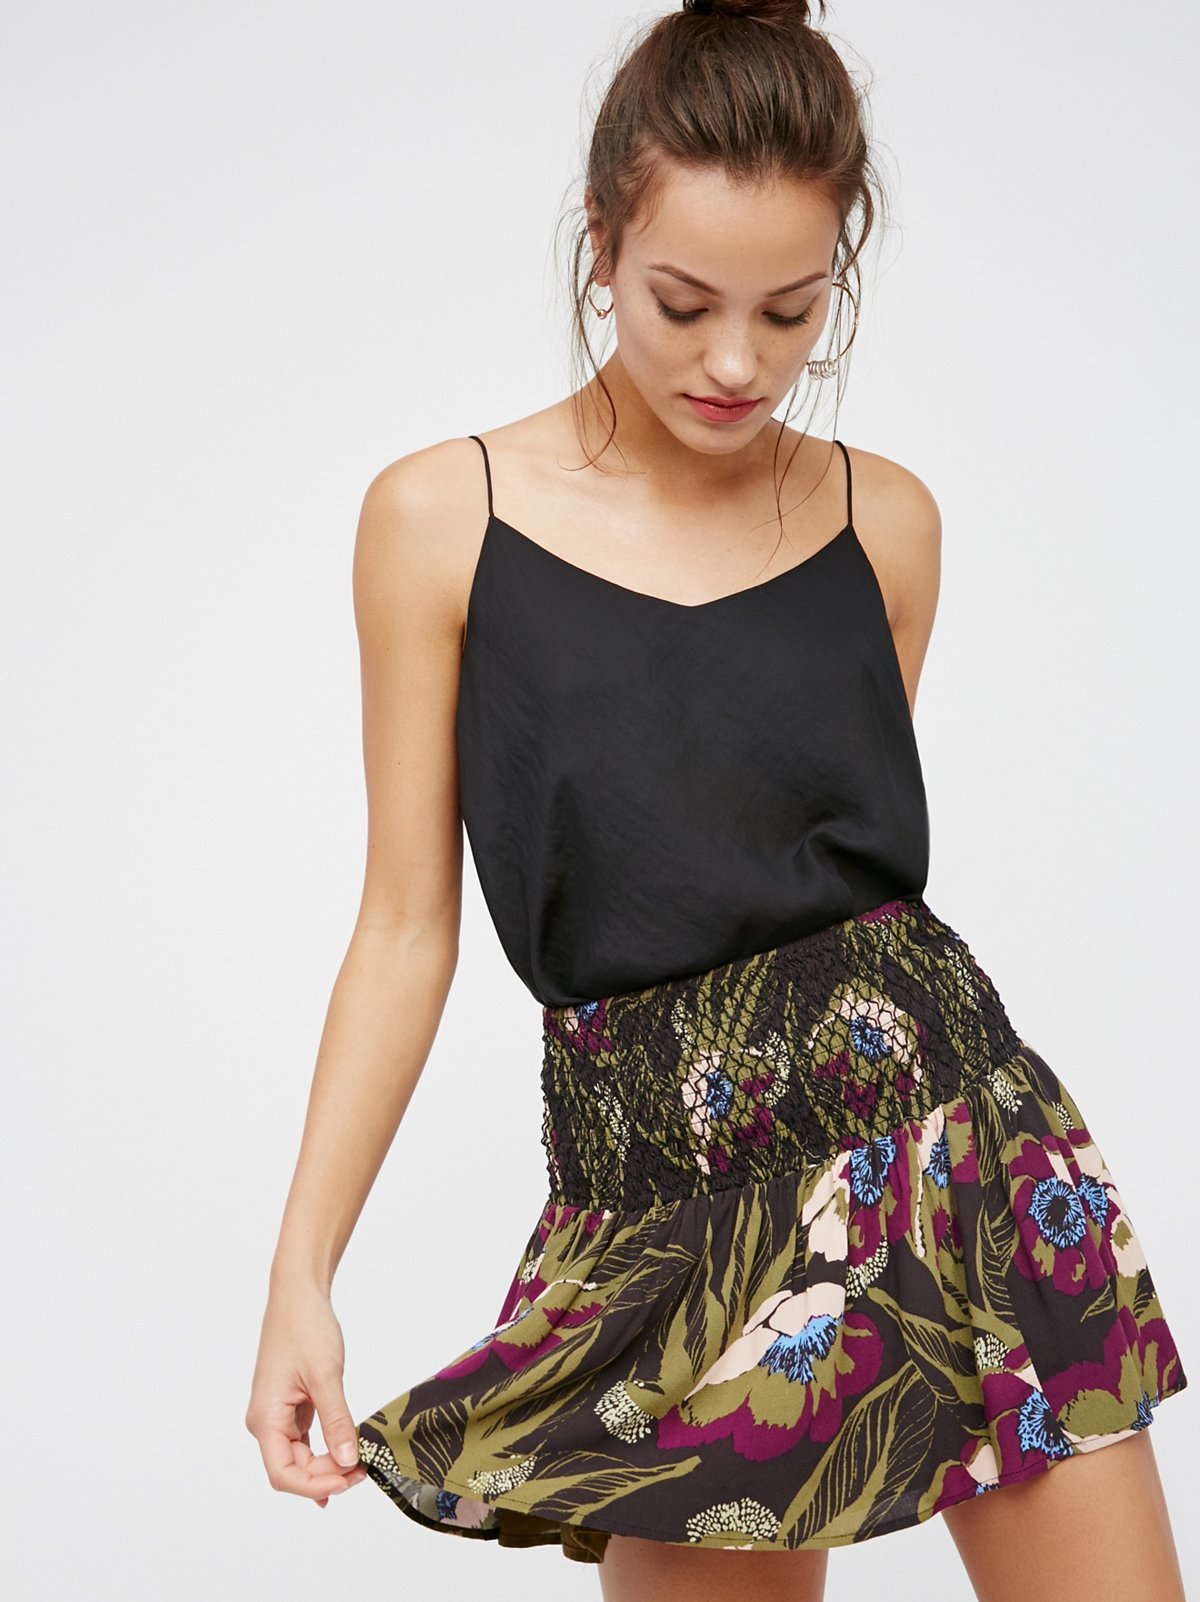 Leave A Trace Mini Skirt